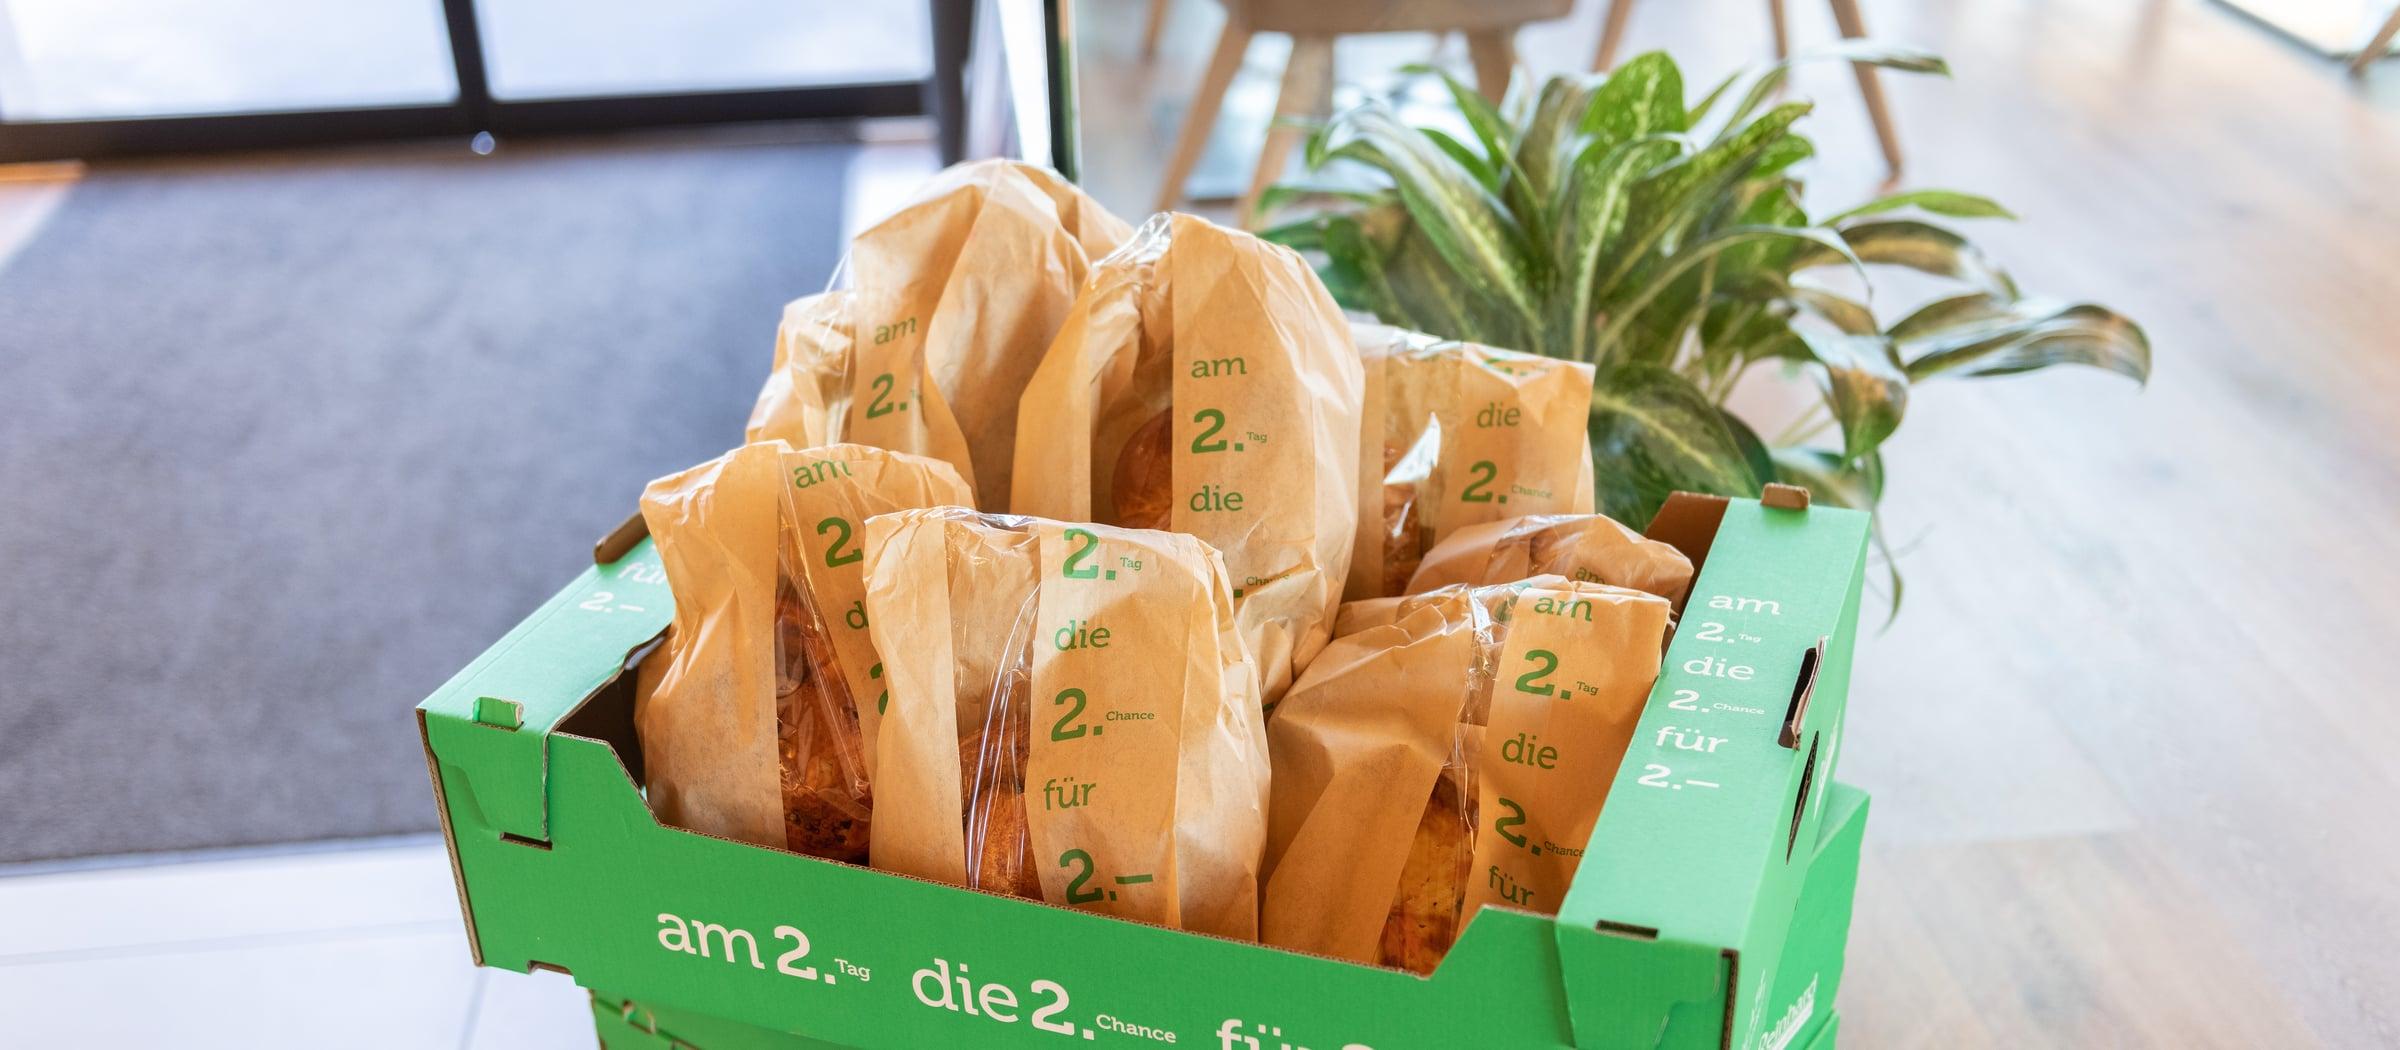 Baeckerei Reinhard AG Pistor Inspiration Food Waste